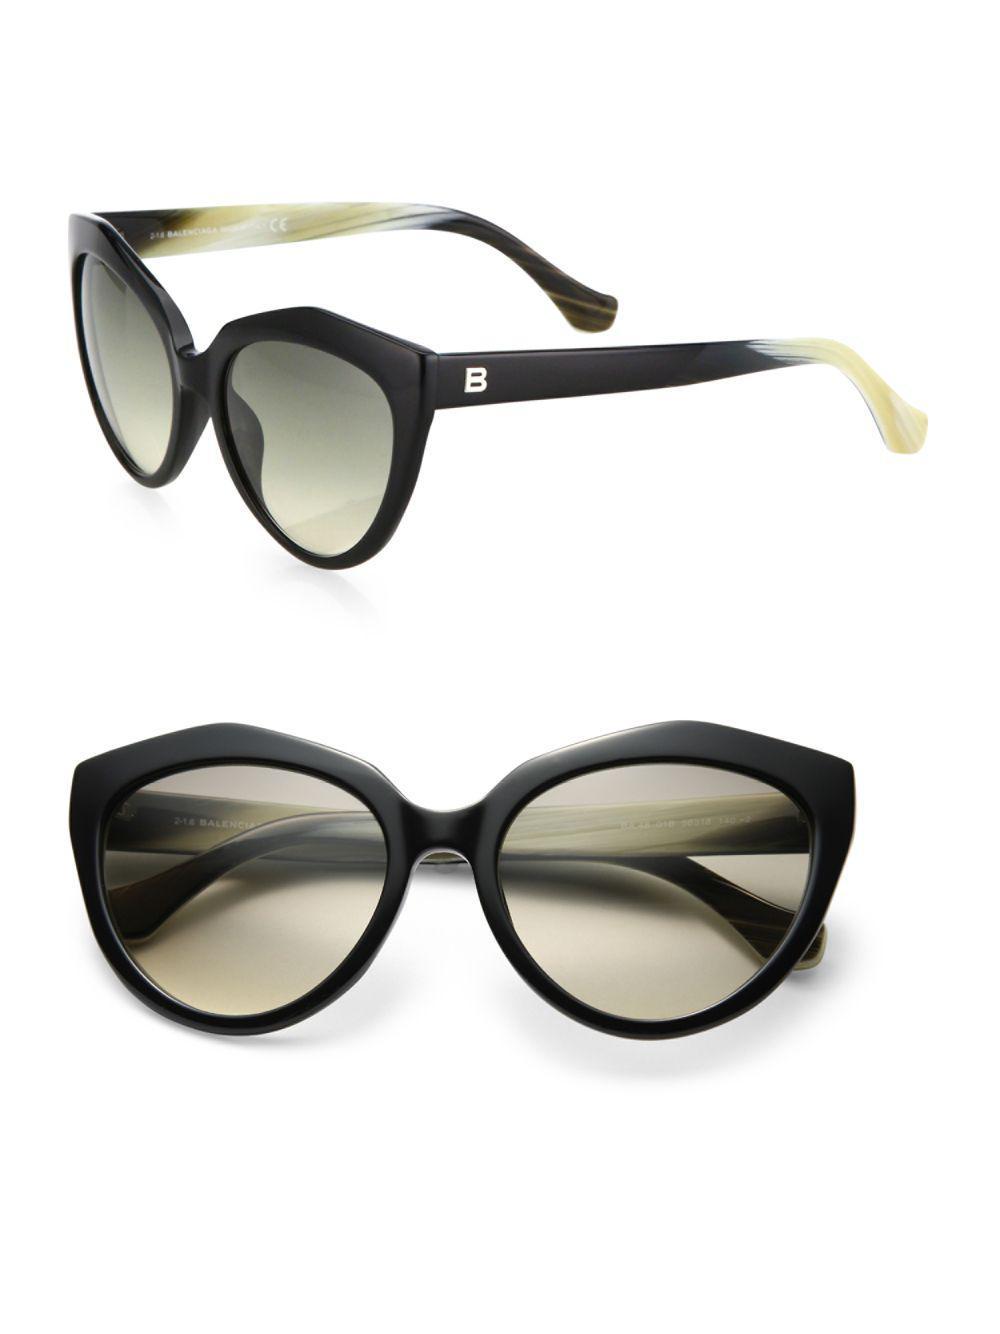 be44ee96b8 Balenciaga 56mm Acetate Cat s-eye Sunglasses in Black for Men - Lyst